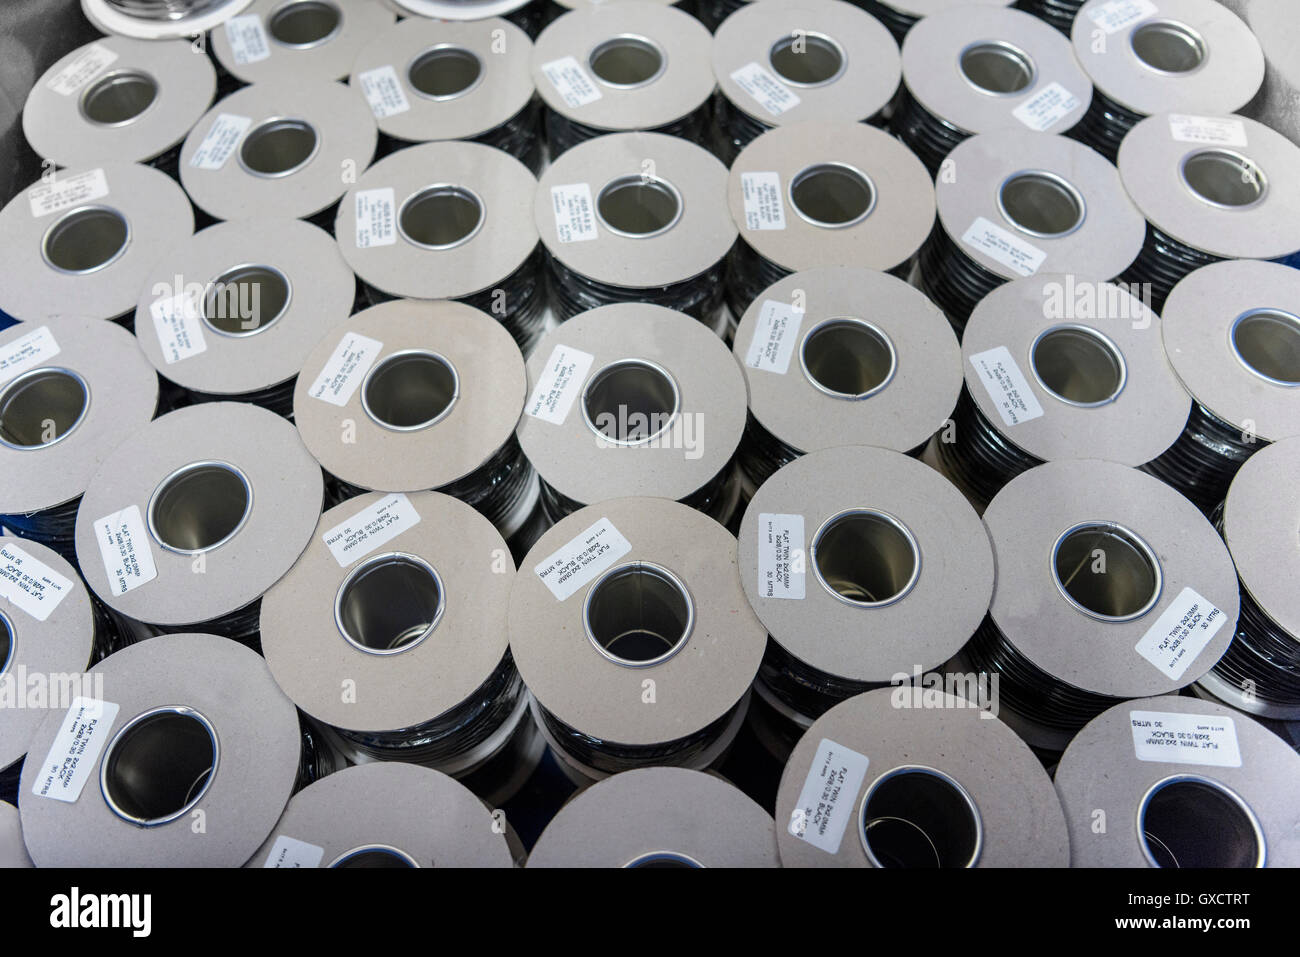 Kabel-Spulen im Kabelwerk Stockfoto, Bild: 119526172 - Alamy